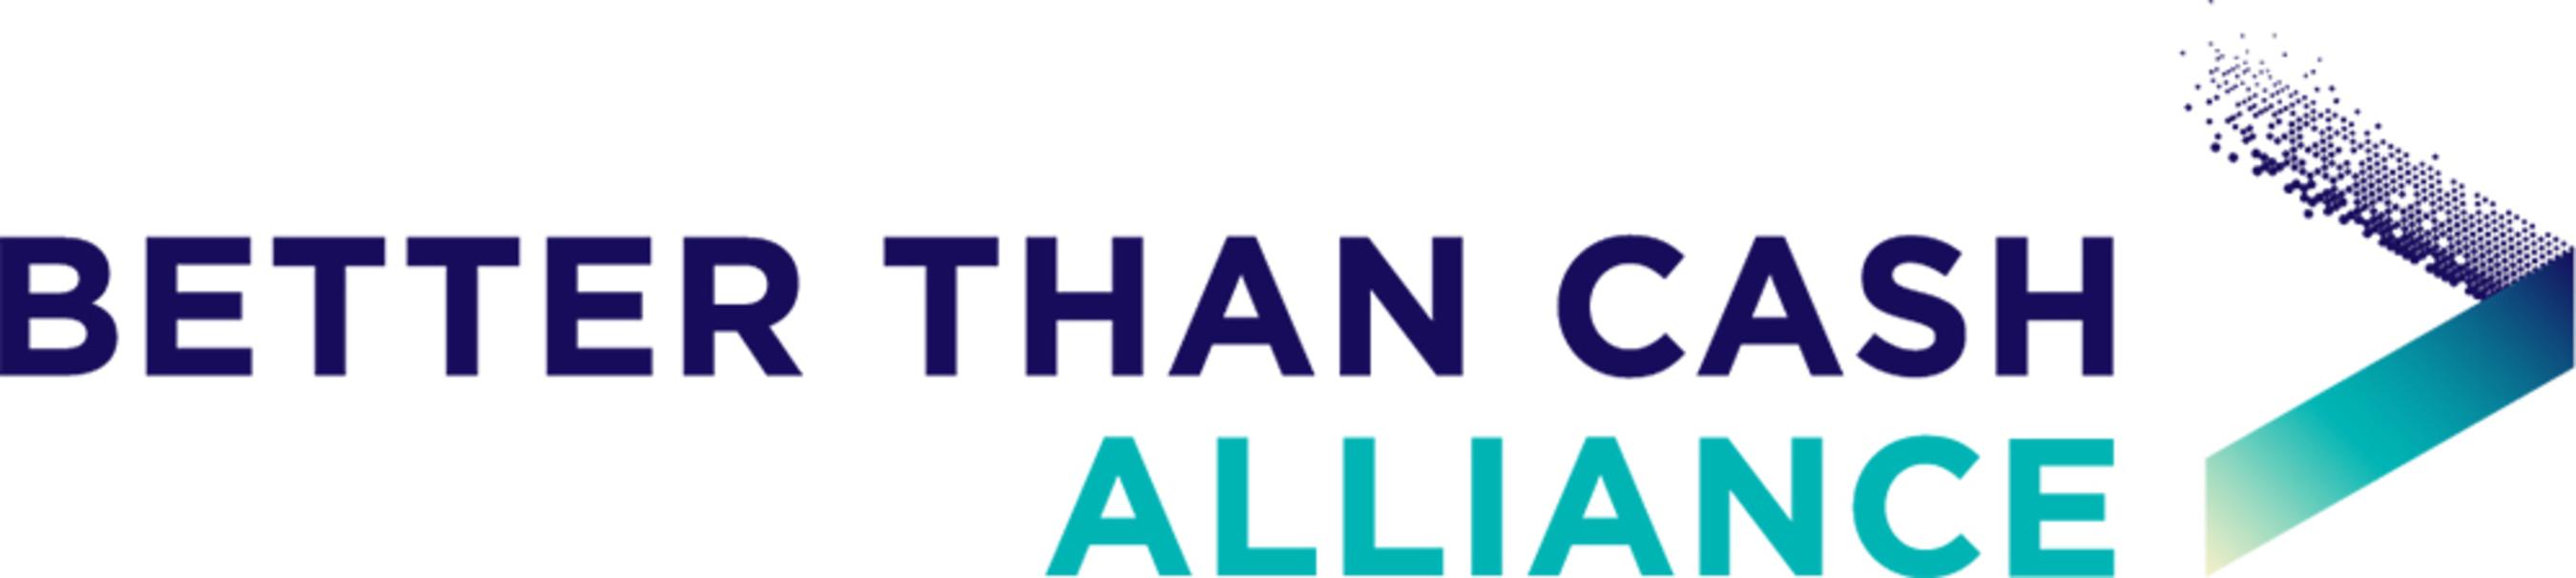 Better Than Cash Alliance www.betterthancash.org